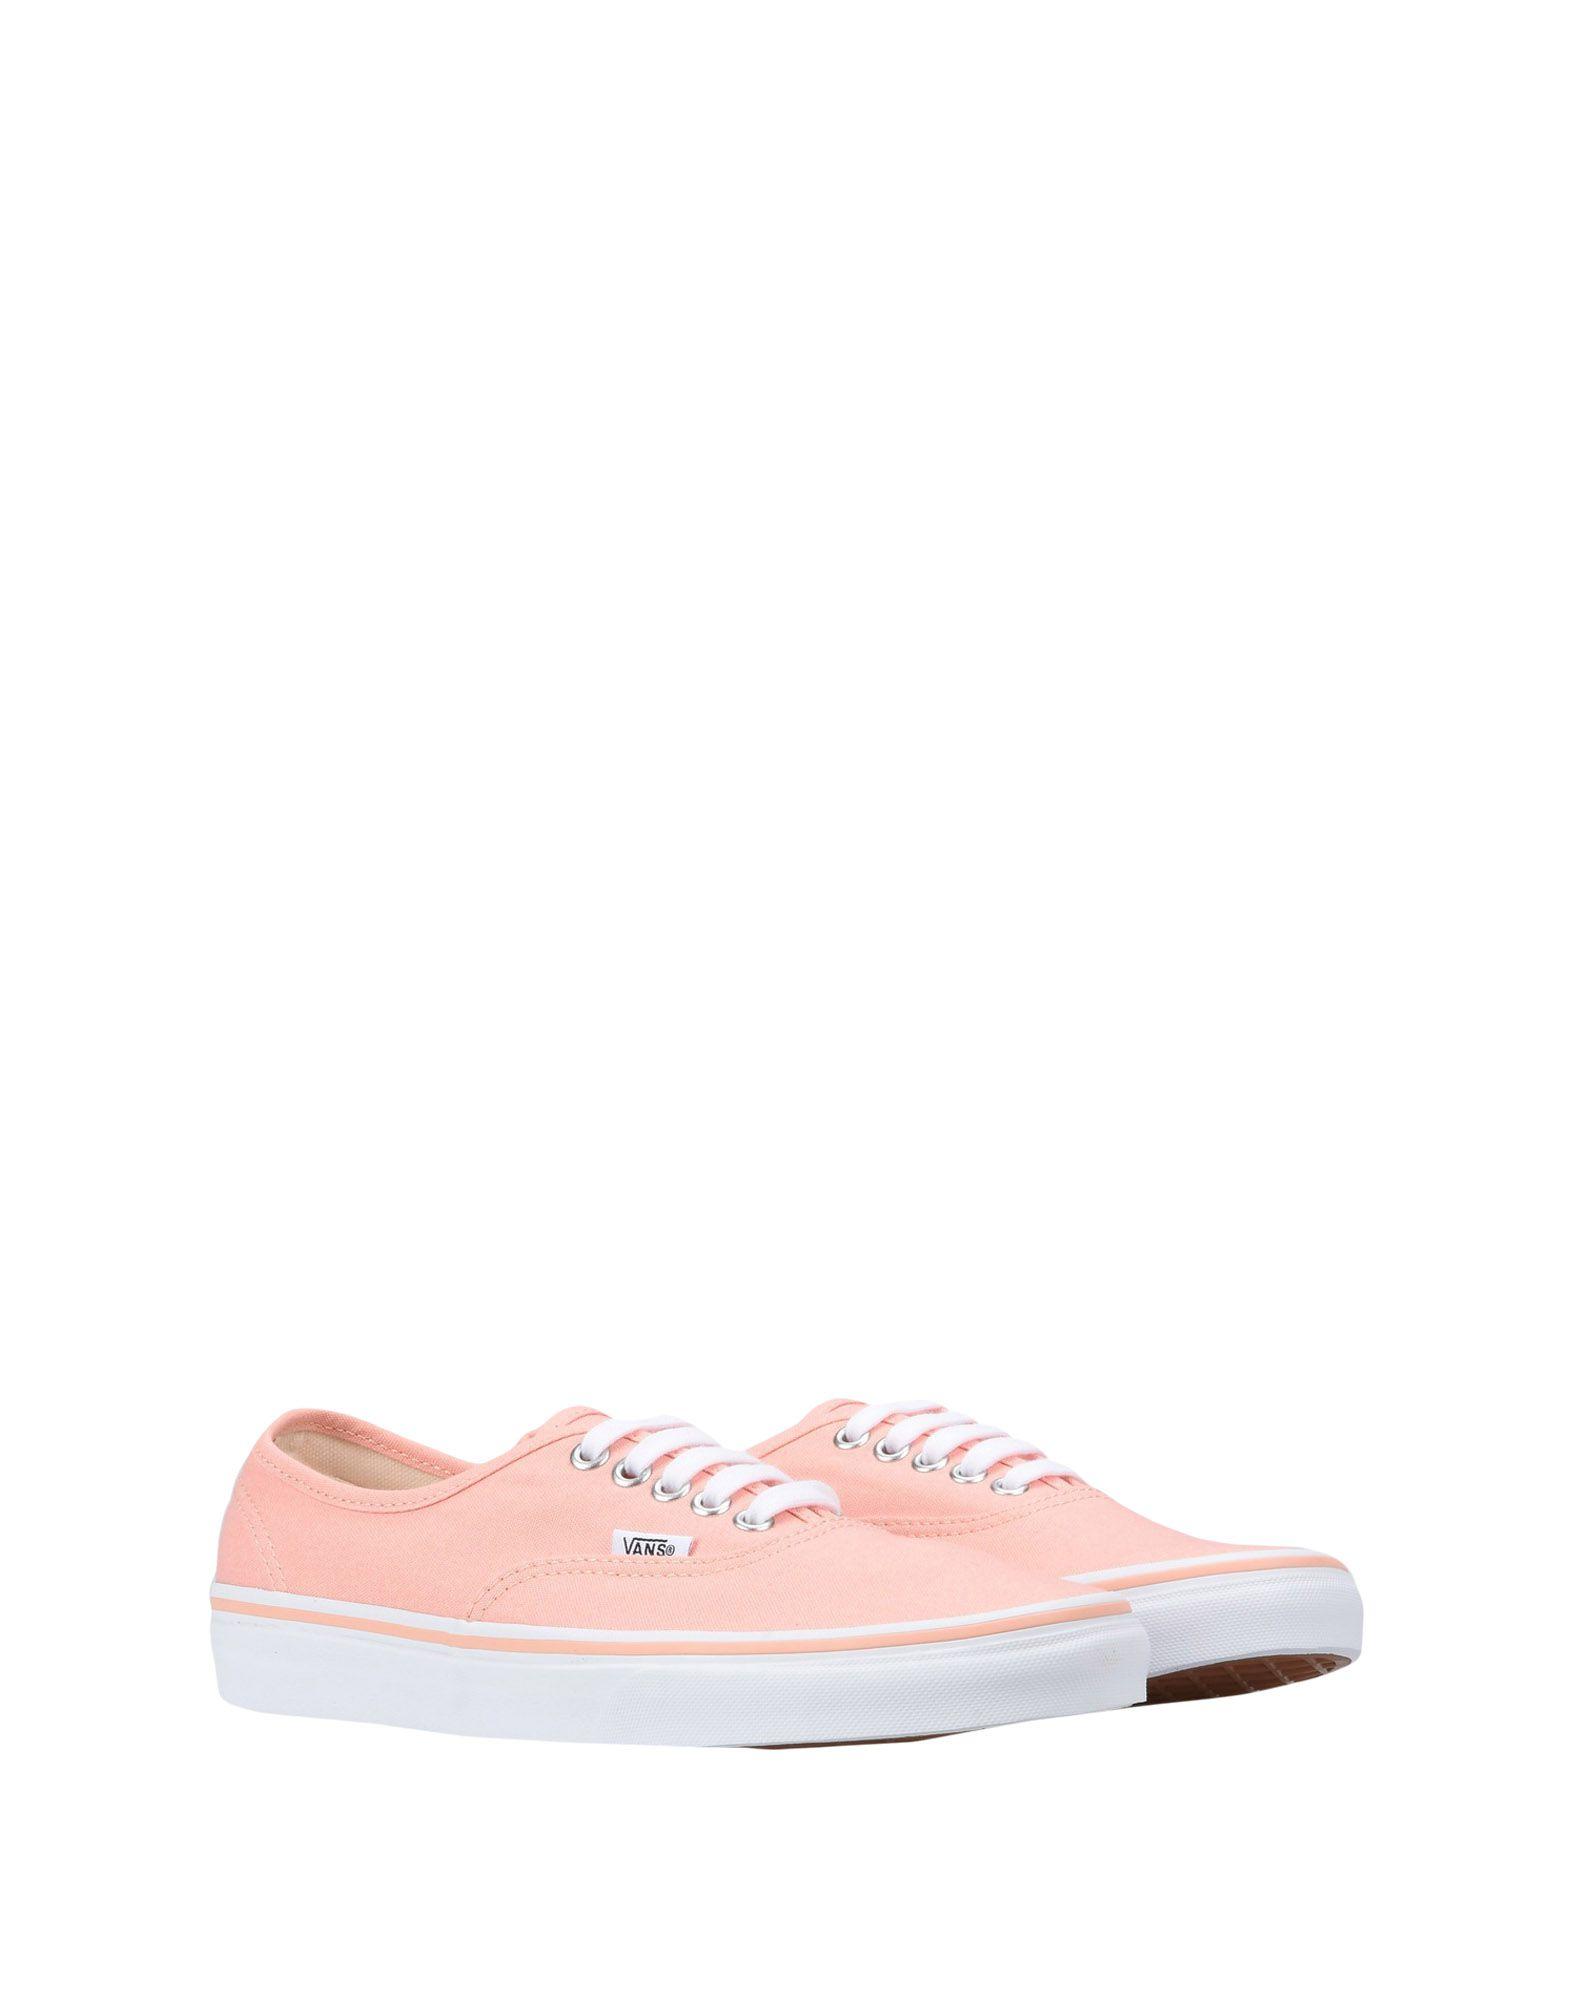 Sneakers Vans Ua Authentic - Tropical - Femme - Sneakers Vans sur